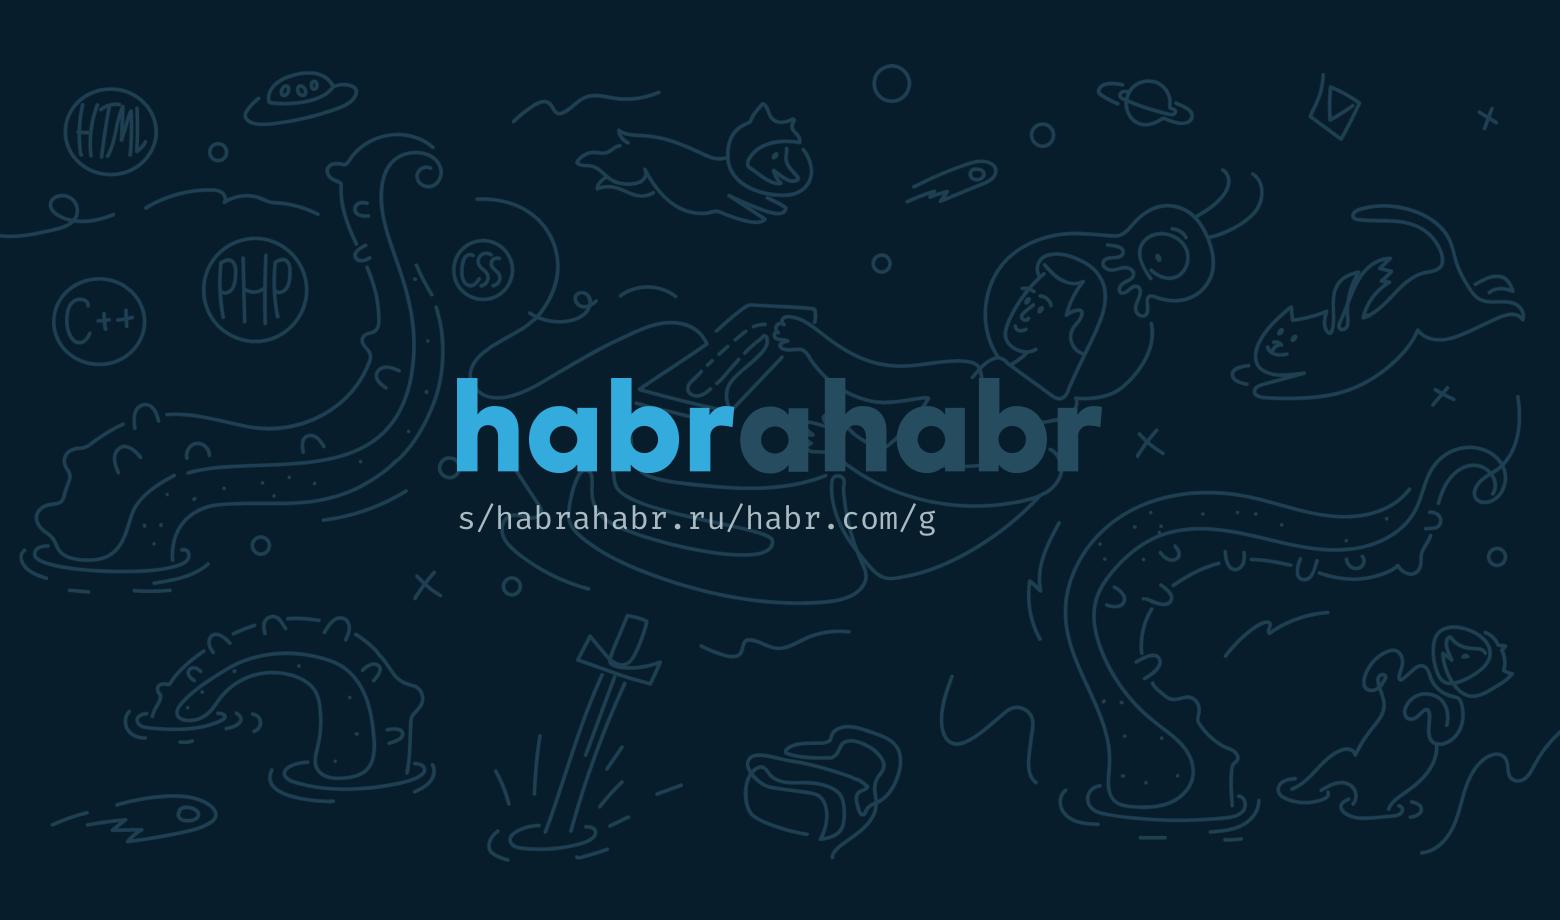 habrahabr.ru → habr.com - 1